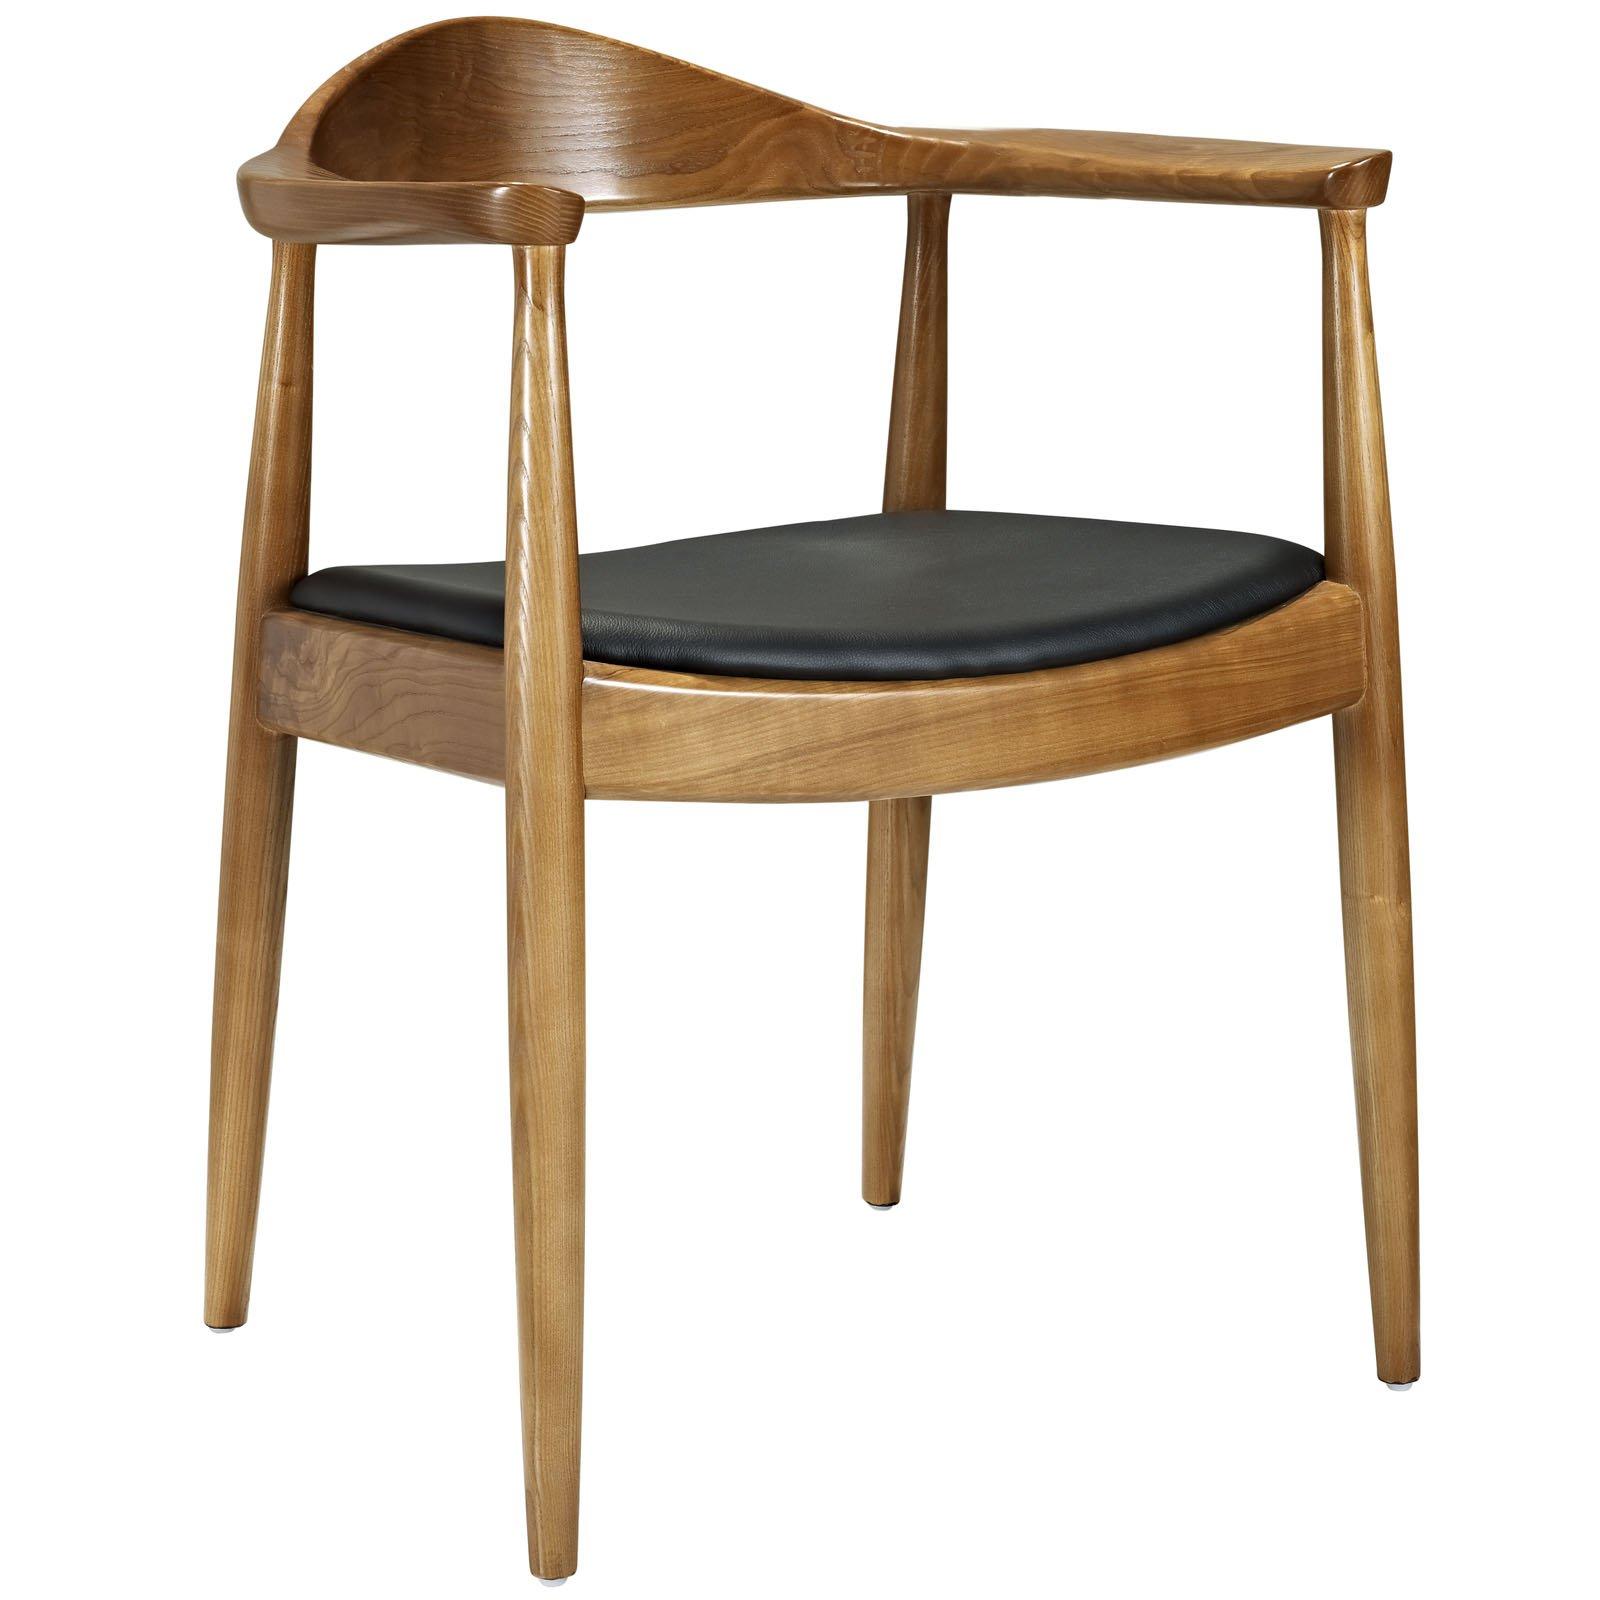 Great Hans Wegner Round Chair #15 - LexMod Hans Wegner Style Presidential Election Round Chair